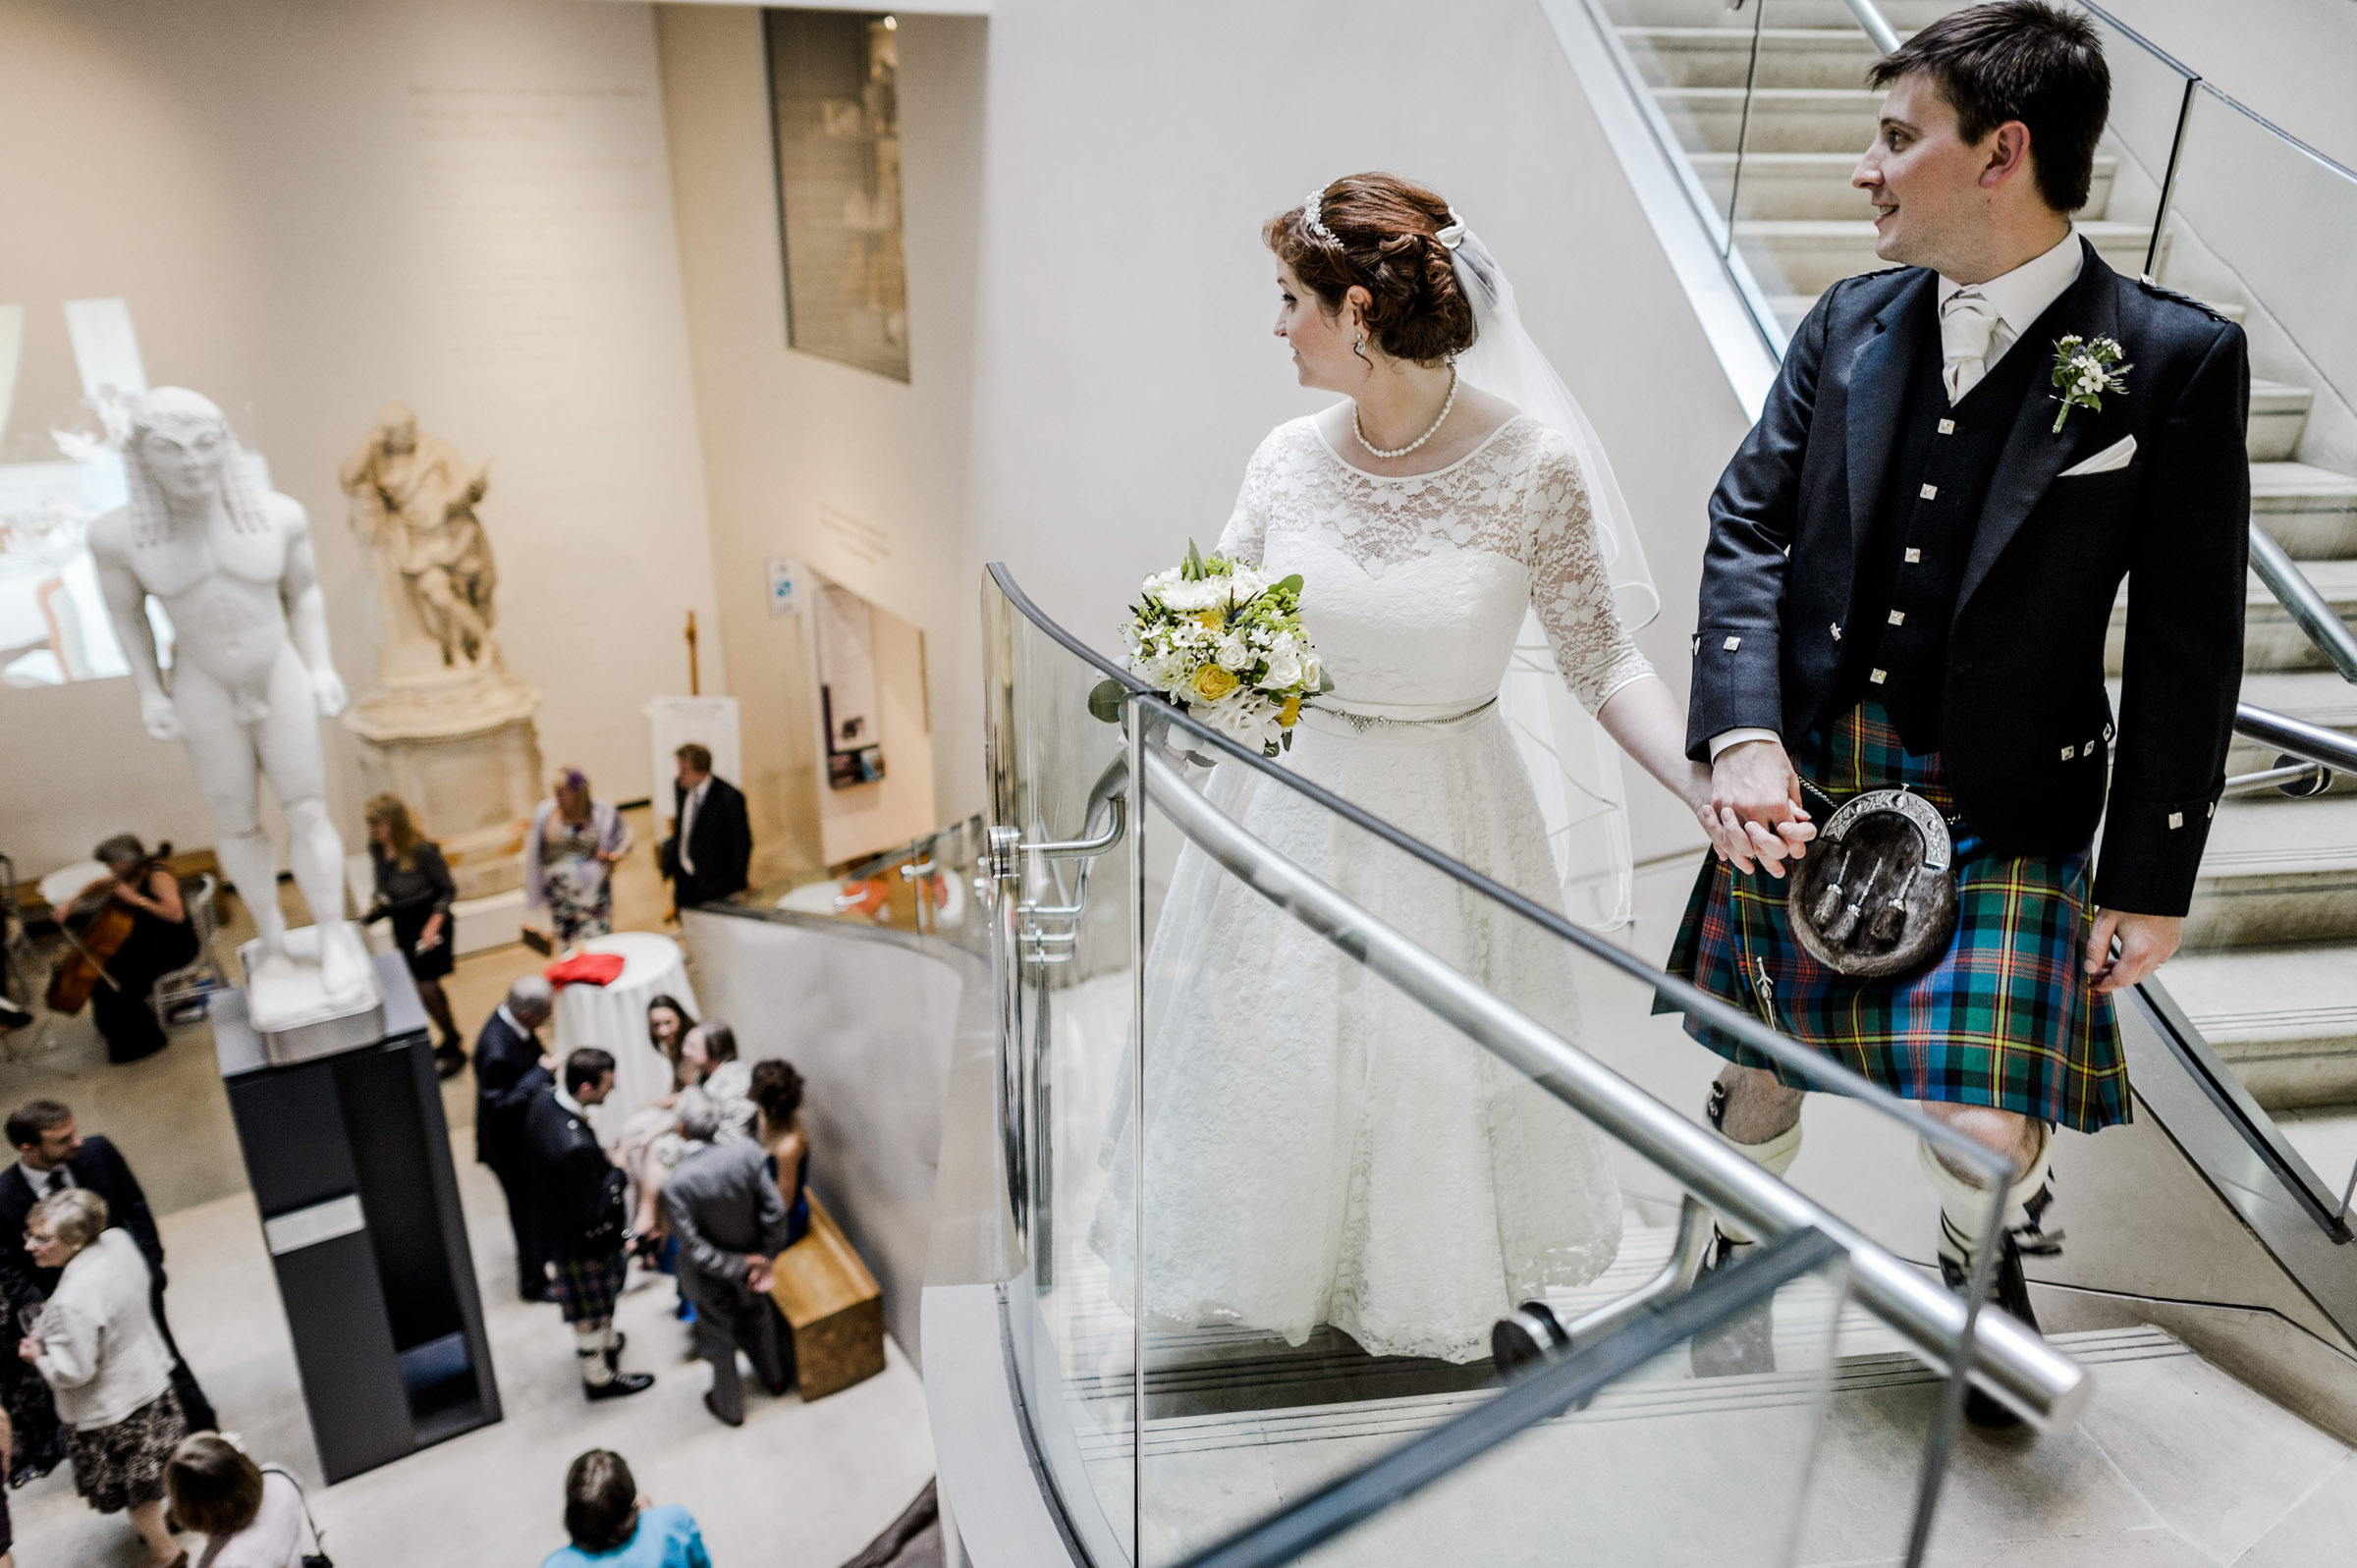 Ashmolean-Museum-Wedding-Pictures-0038.jpg